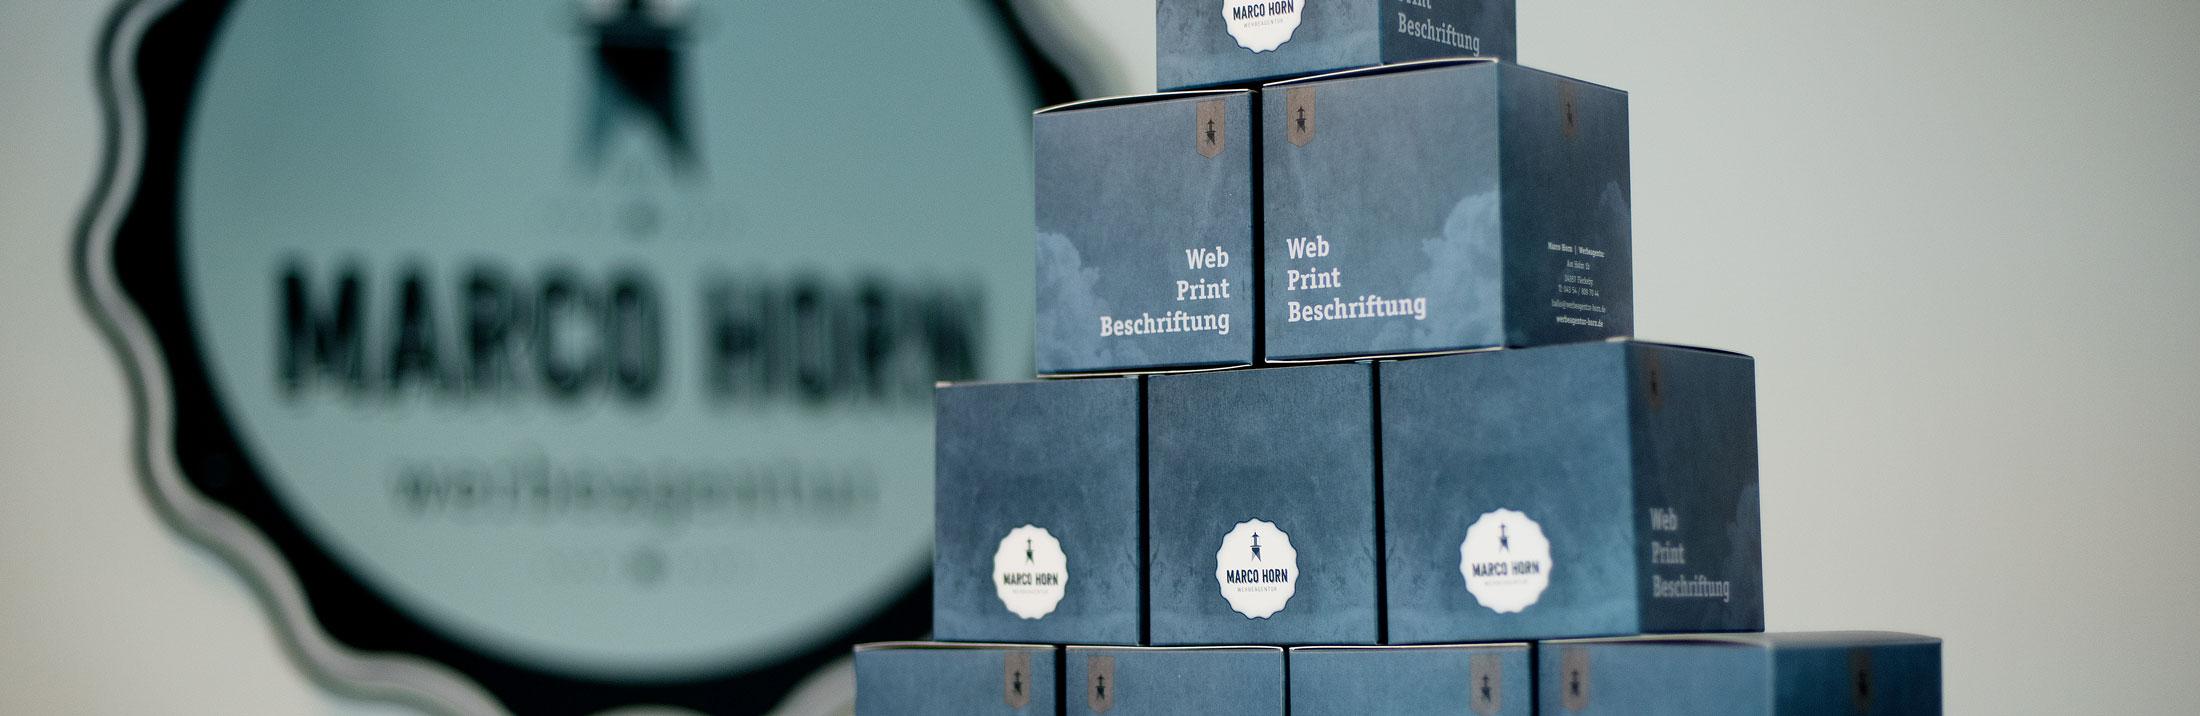 Werbeagentur-Marco-Horn-Head-Home